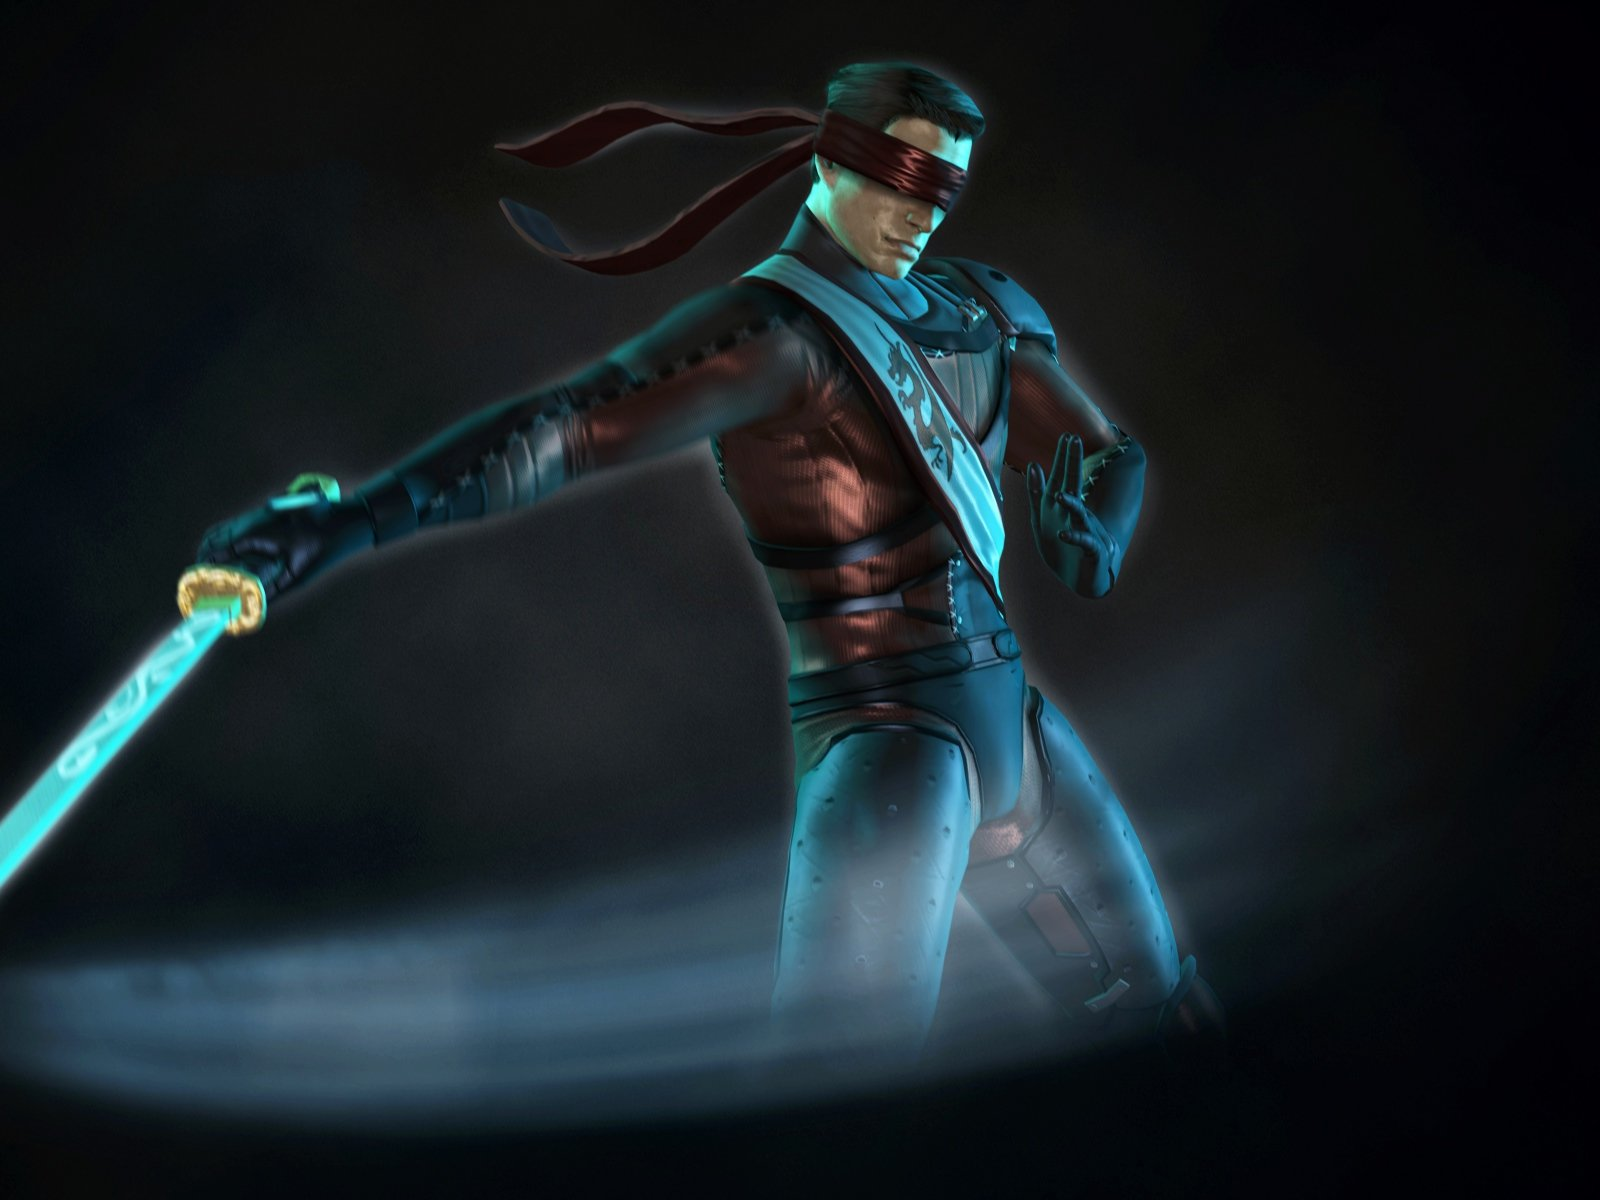 Mortal kombat, Kenshi, Katana 1600×1200 HD Background